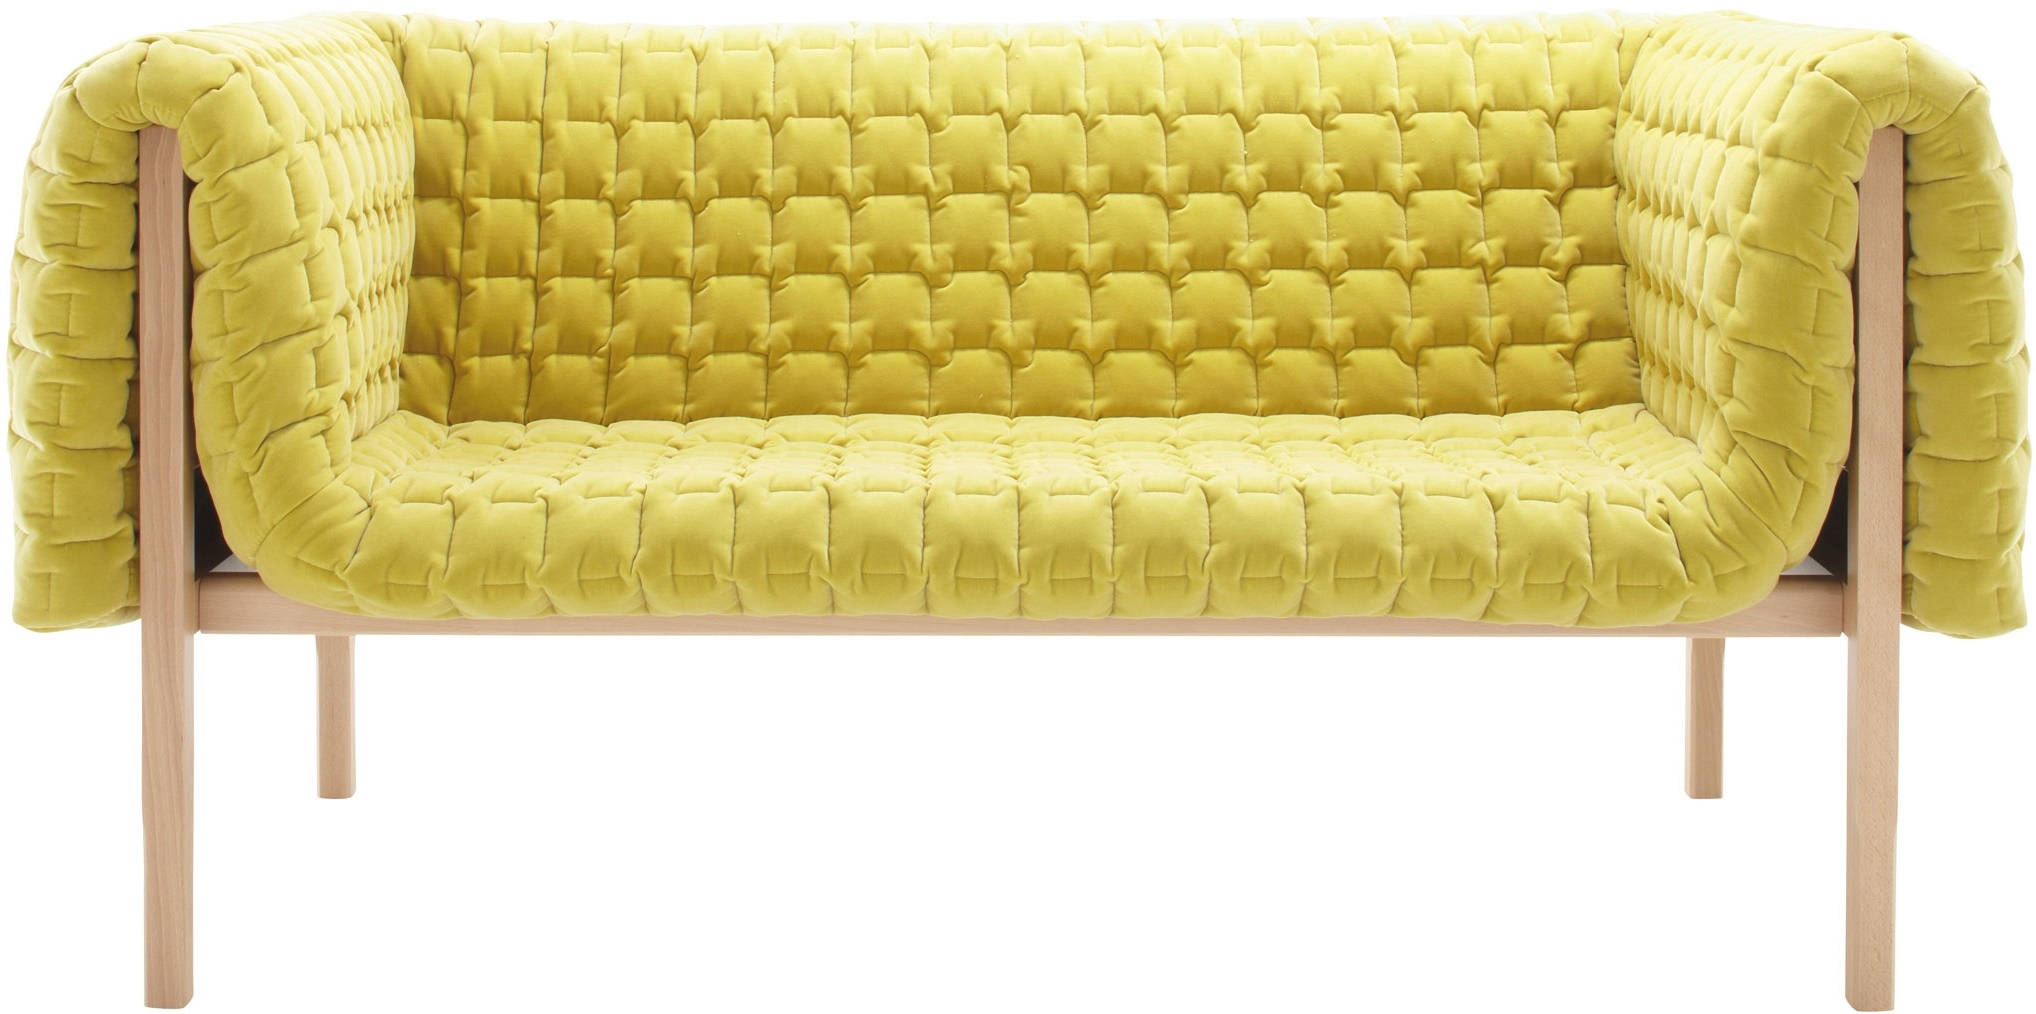 Full Size of Ligne Roset Multy Sofa Bed For Sale Togo Gebraucht Dimensions Feng Furniture Ebay Uk Ruch Milia Shop Lila Für Esszimmer Mit Bettfunktion Recamiere Antikes Sofa Ligne Roset Sofa